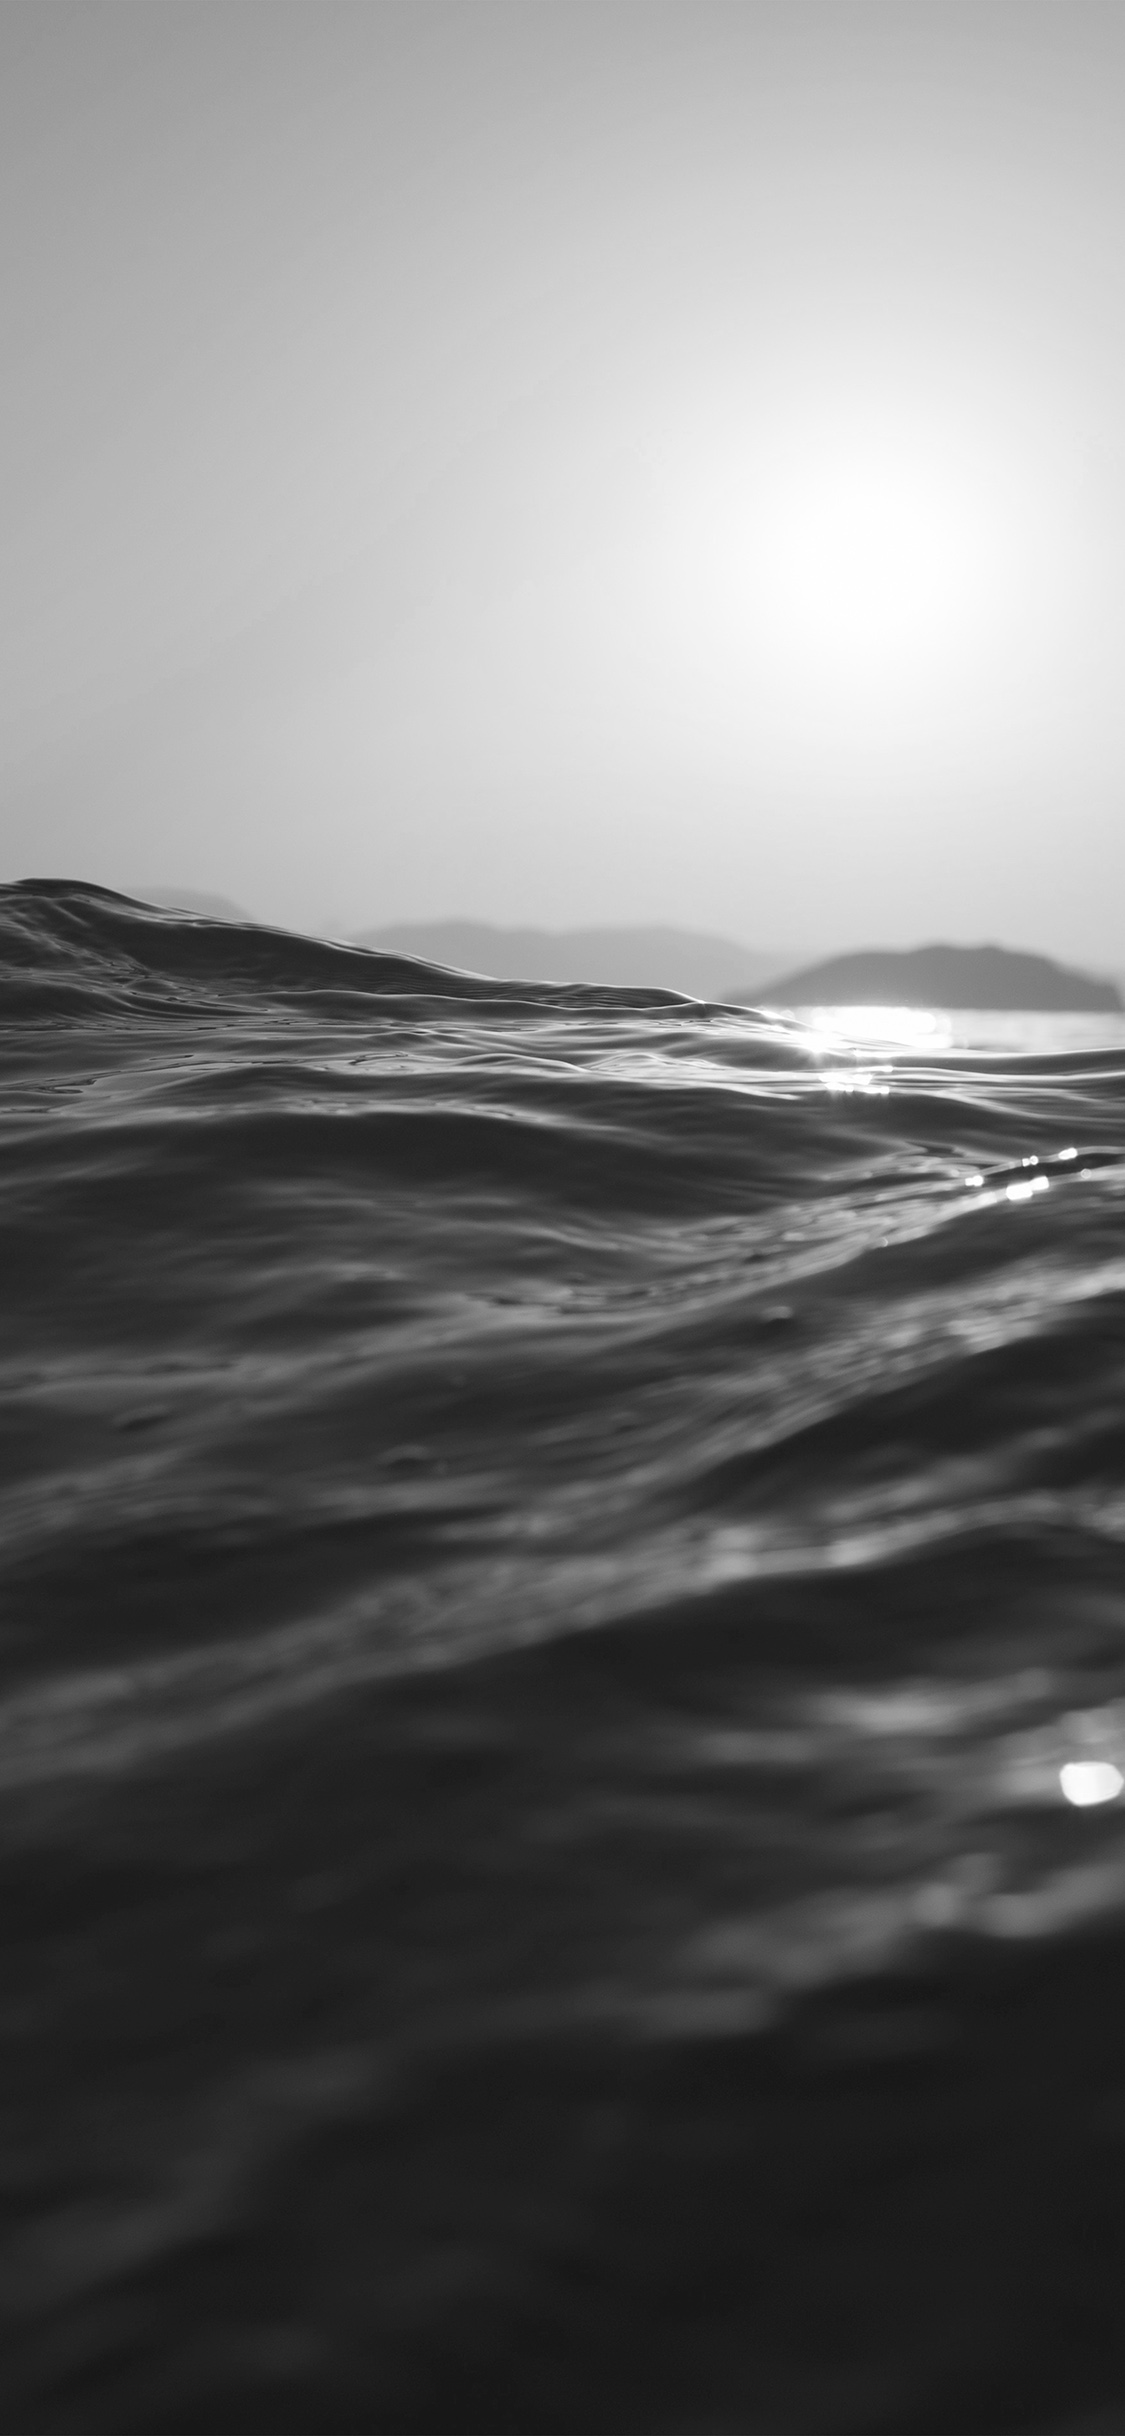 iPhoneXpapers.com-Apple-iPhone-wallpaper-mt84-sea-dive-wave-dark-summer-ocean-nature-bw